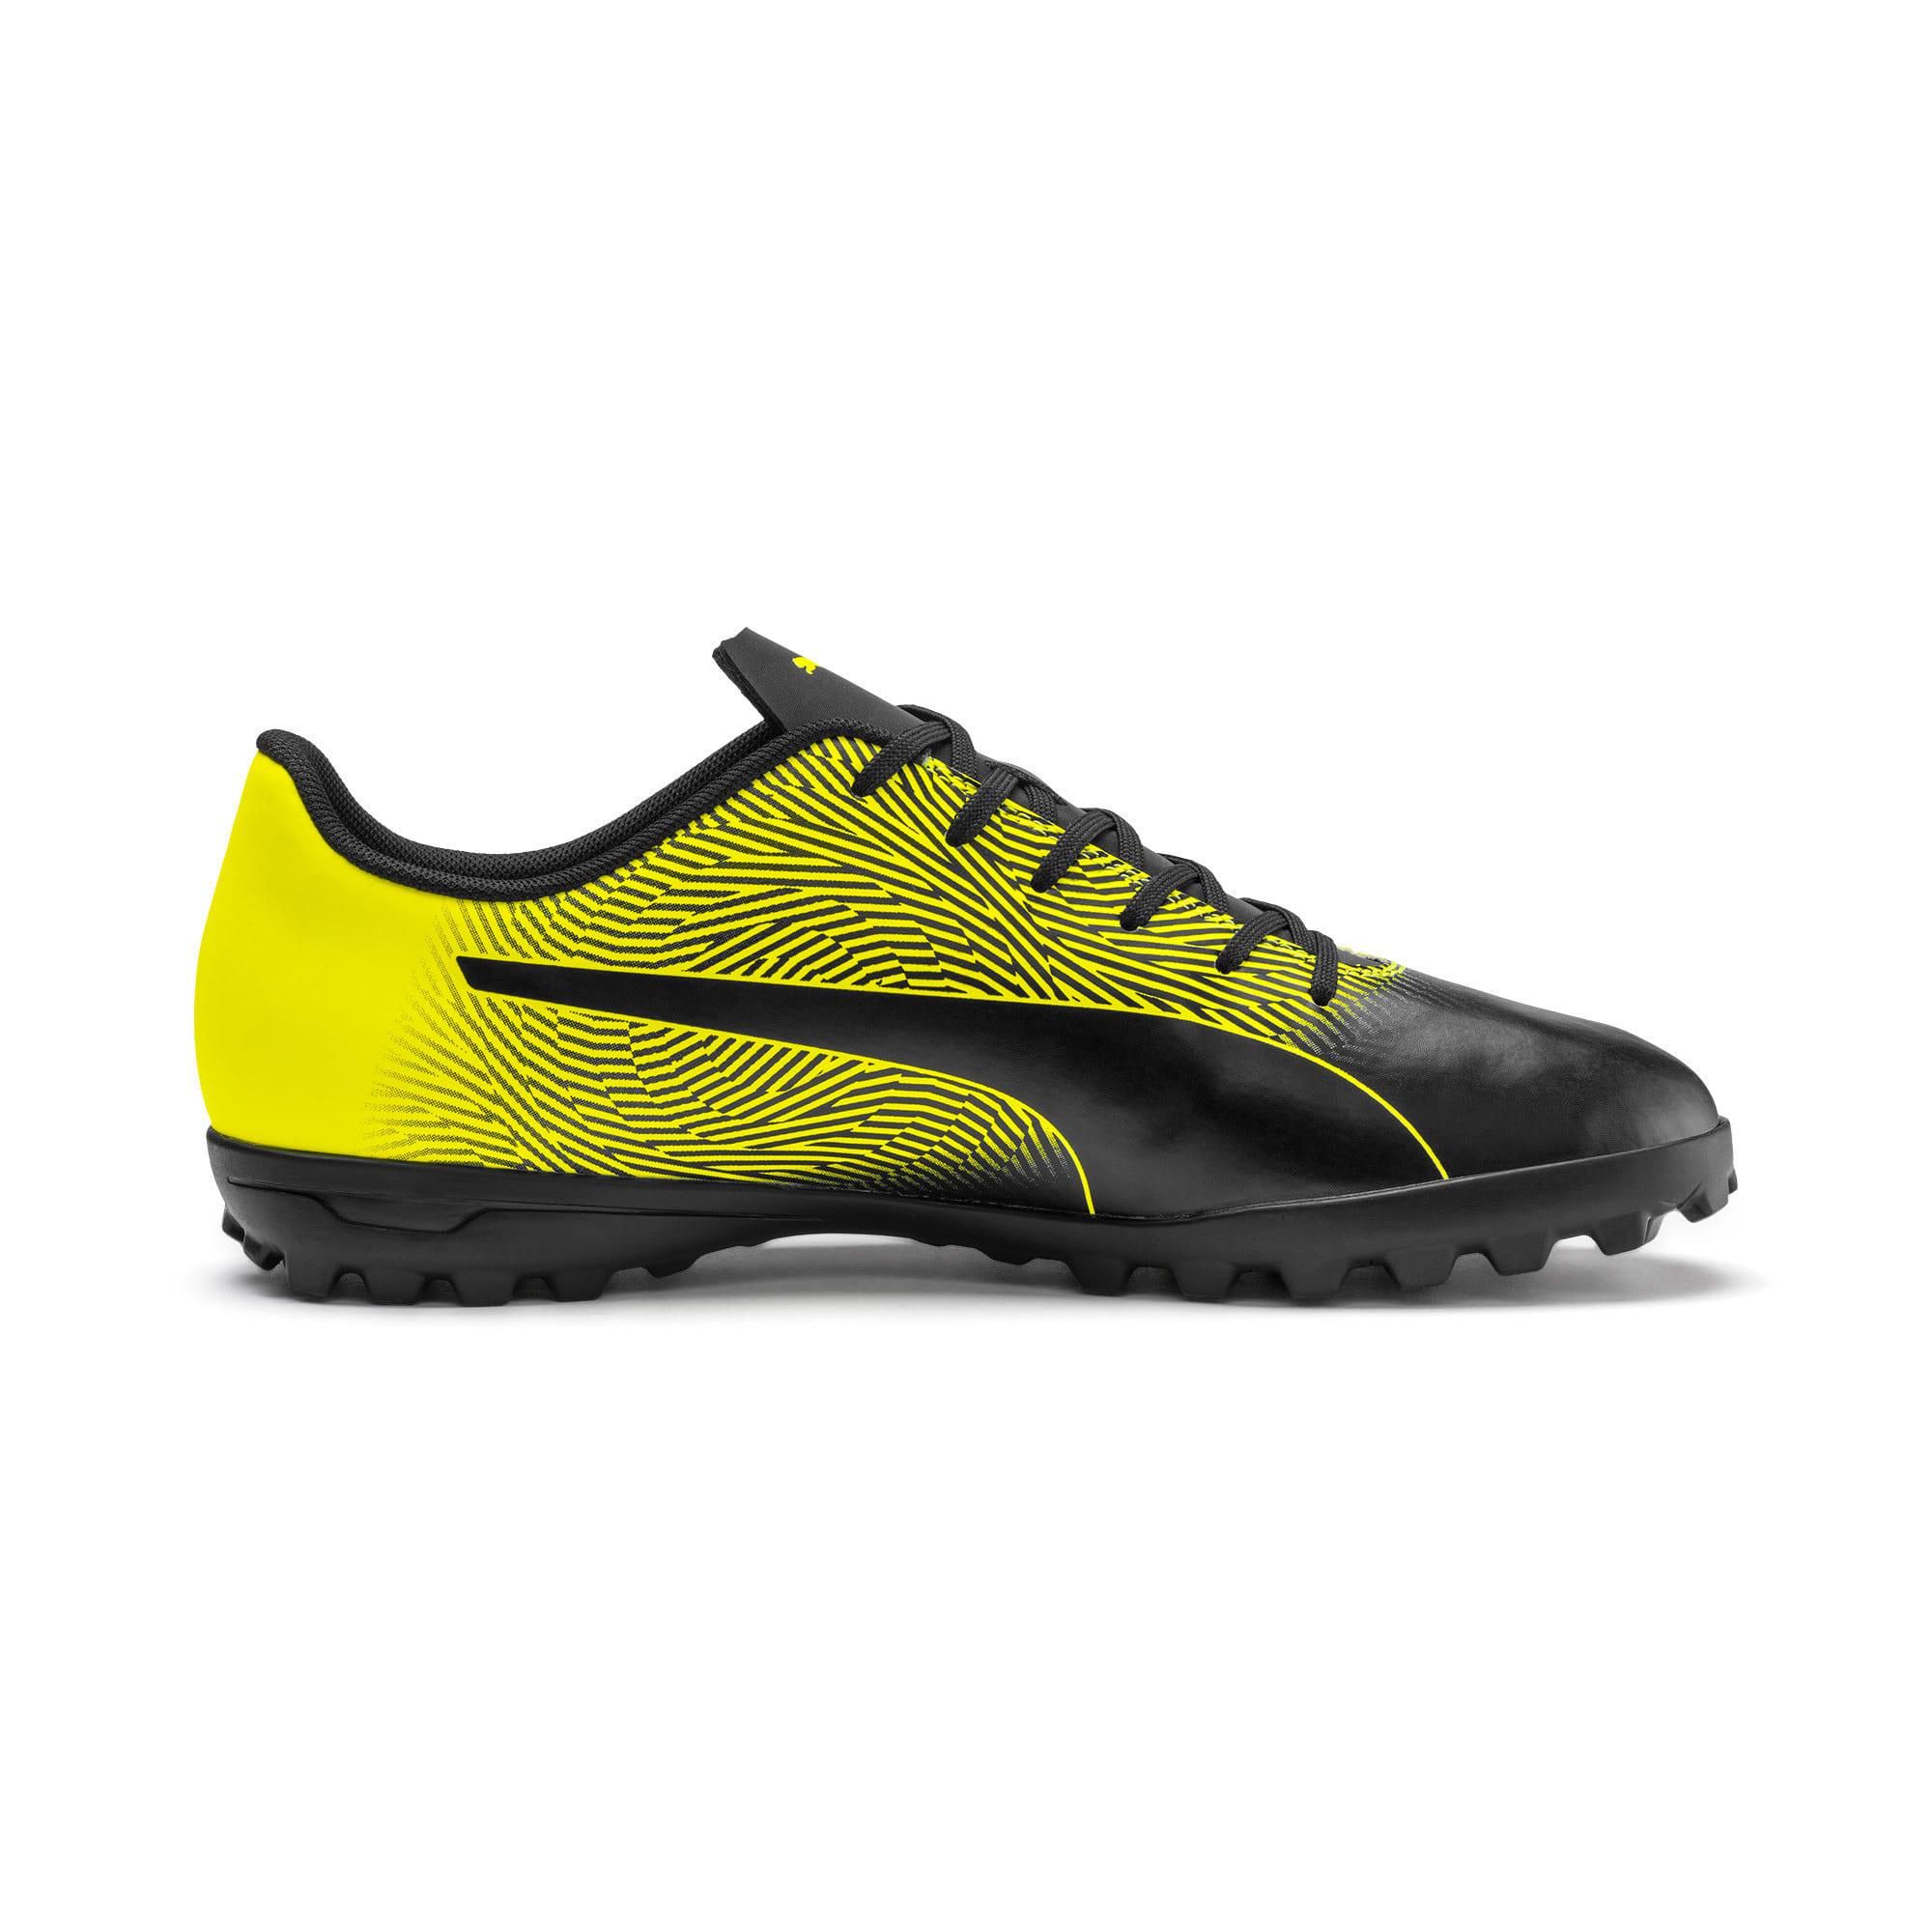 Thumbnail 6 of PUMA Spirit II TT Men's Soccer Shoes, Puma Black-Yellow Alert, medium